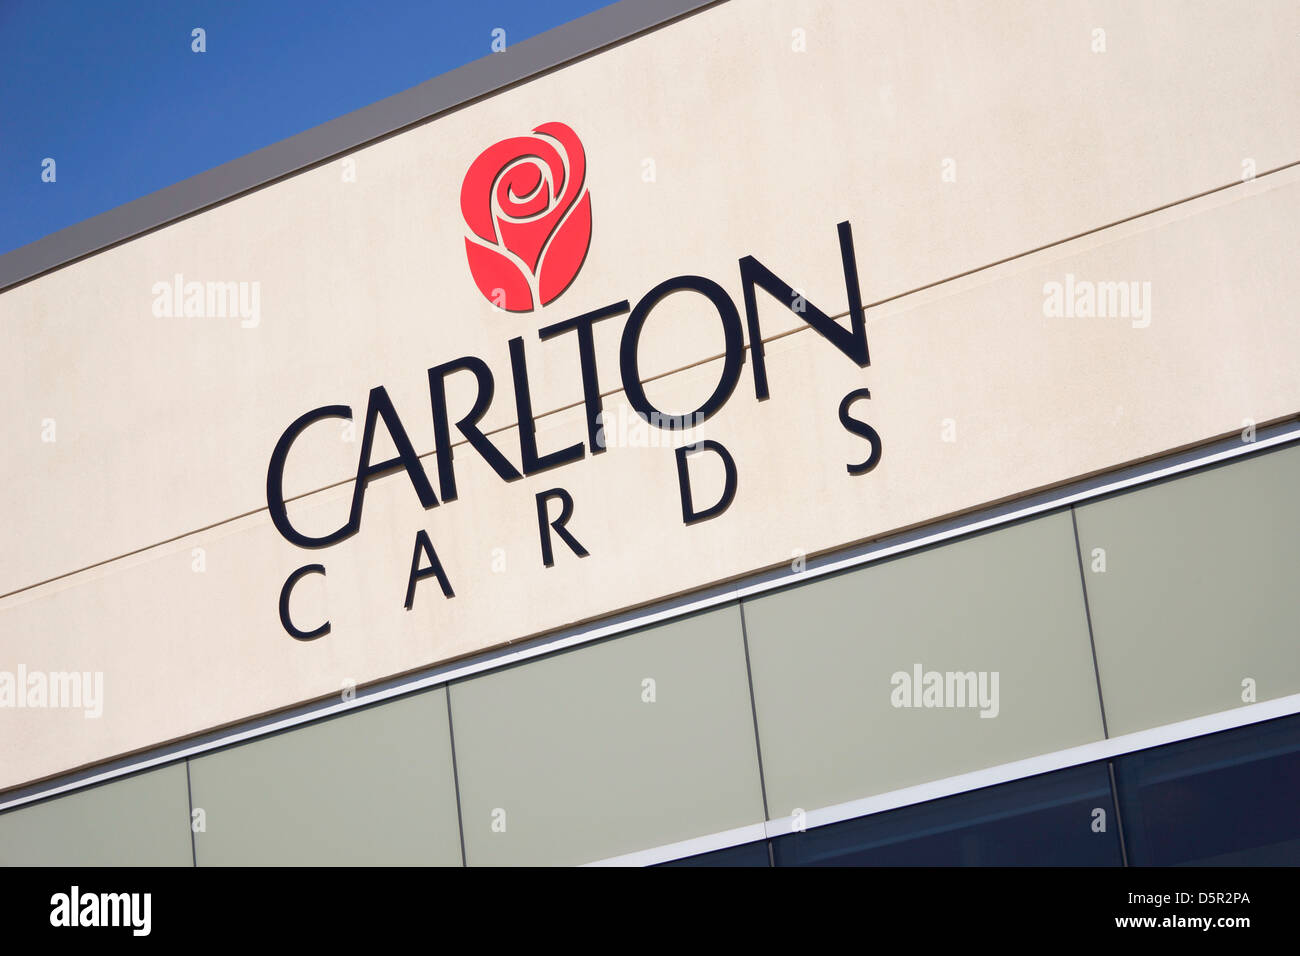 Carlton Cards Sign, Logo - Stock Image